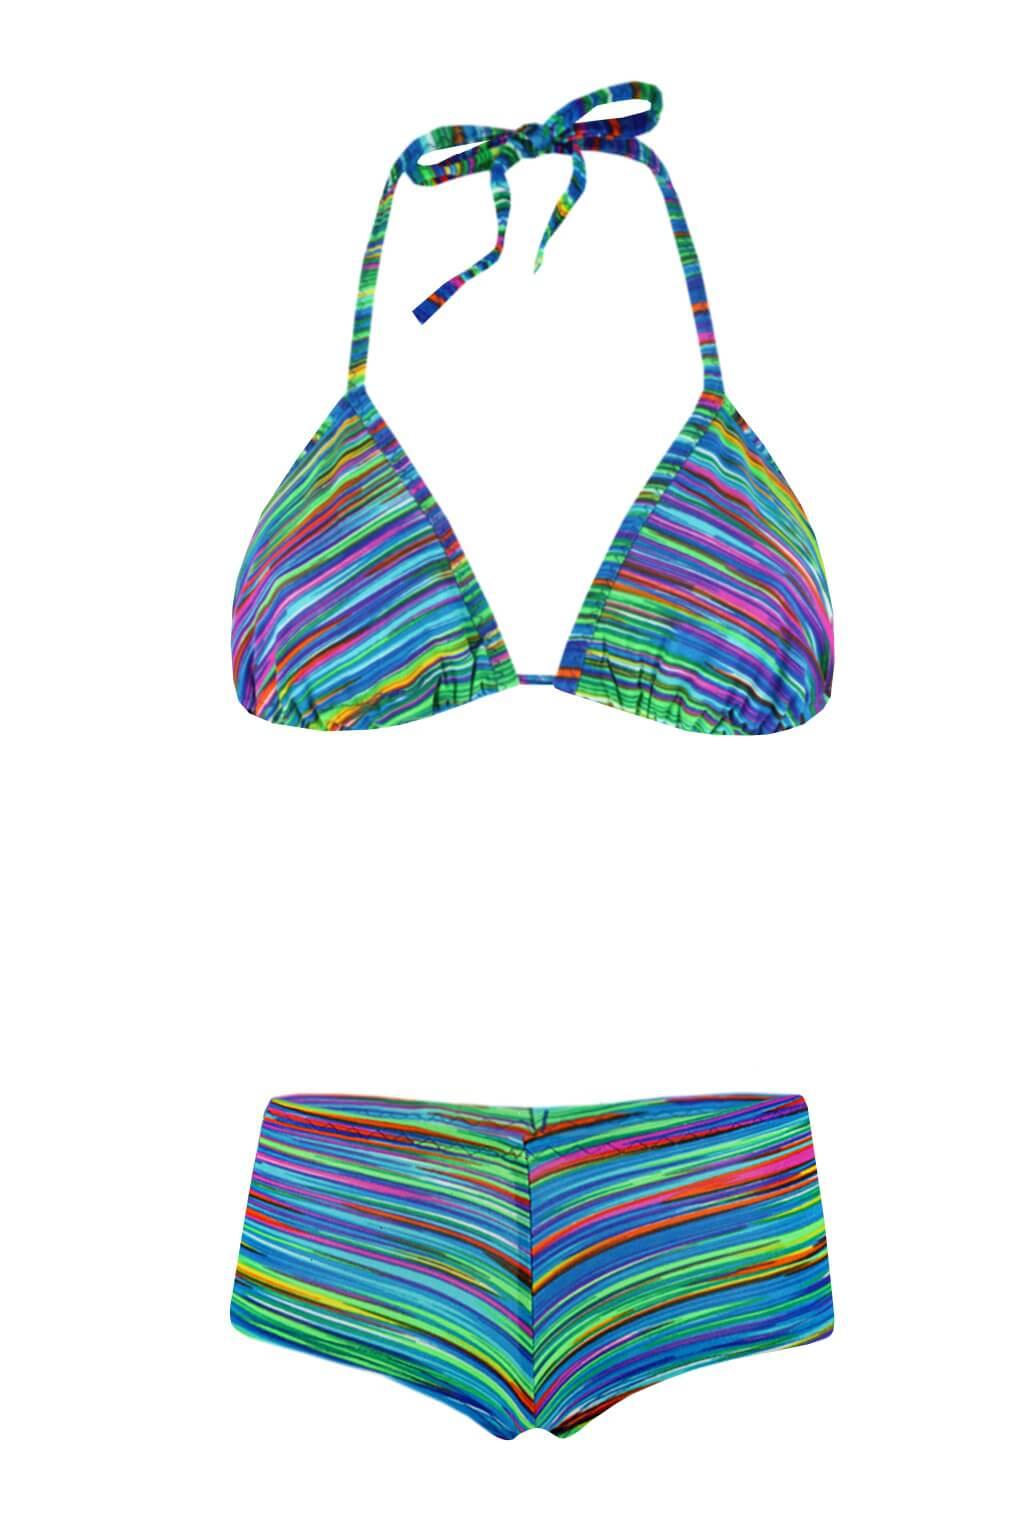 Aqua D neonové plavky XS modrá